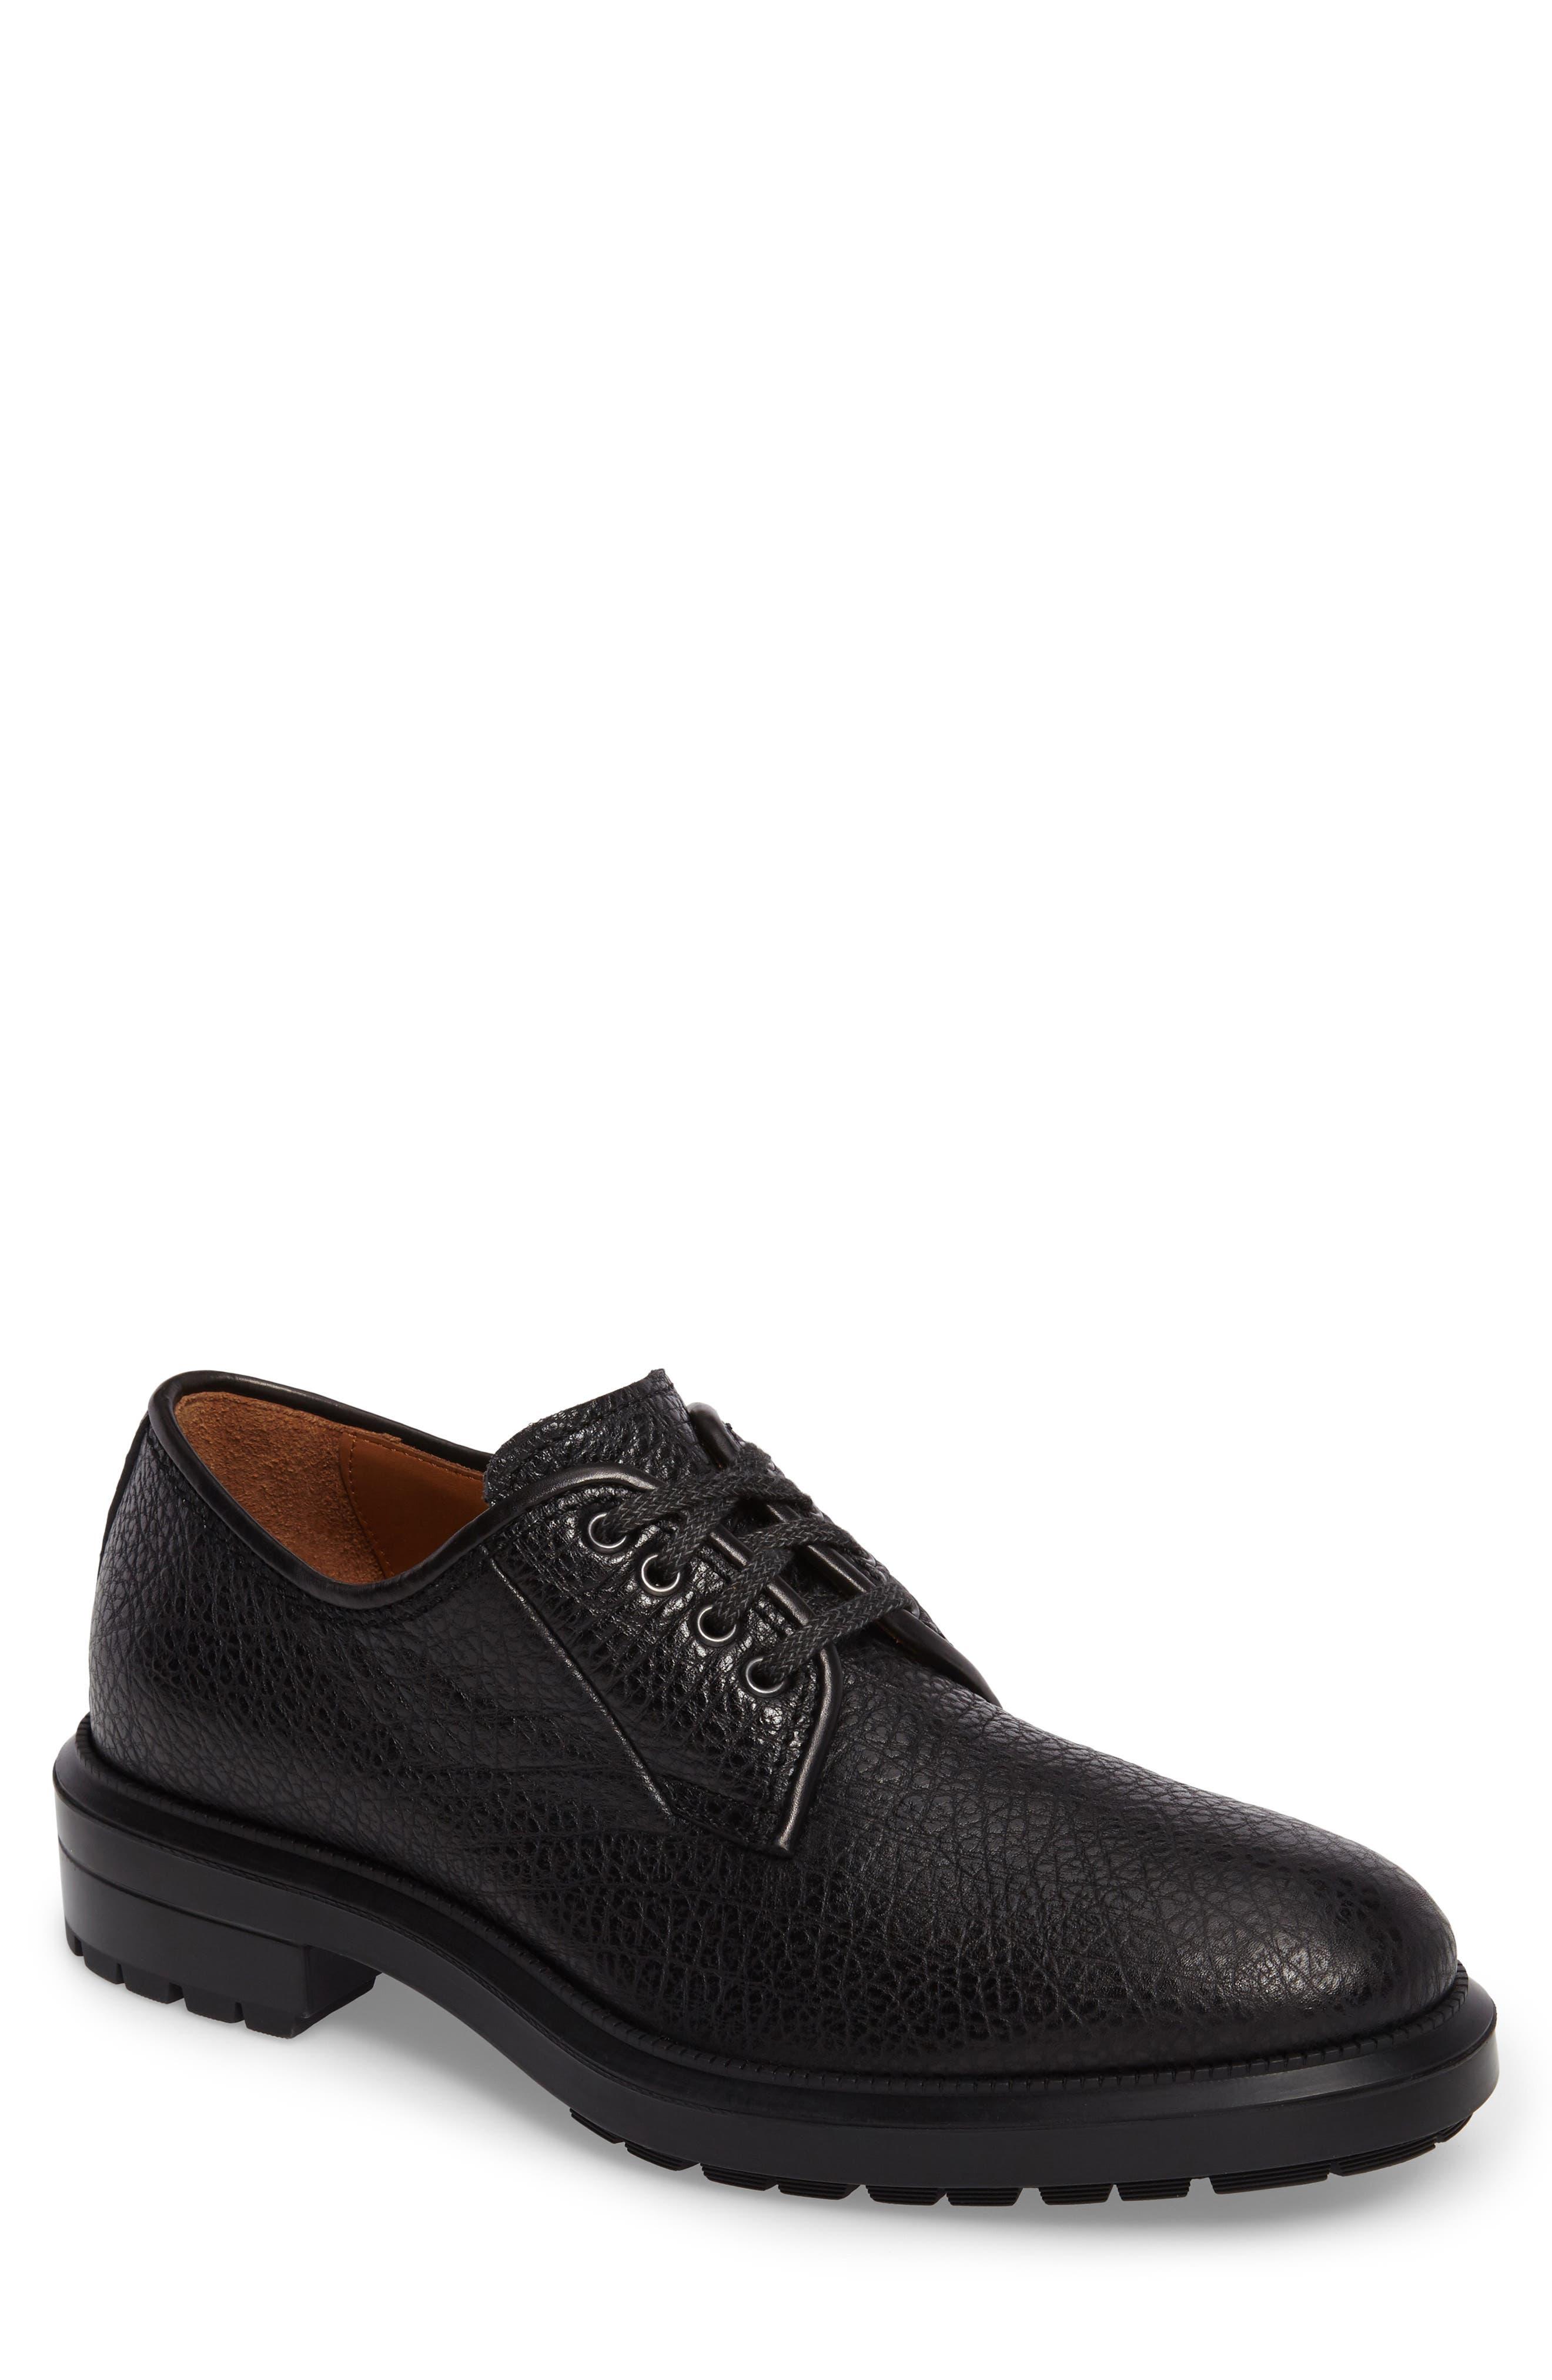 Tucker Plain Toe Derby,                         Main,                         color, Black